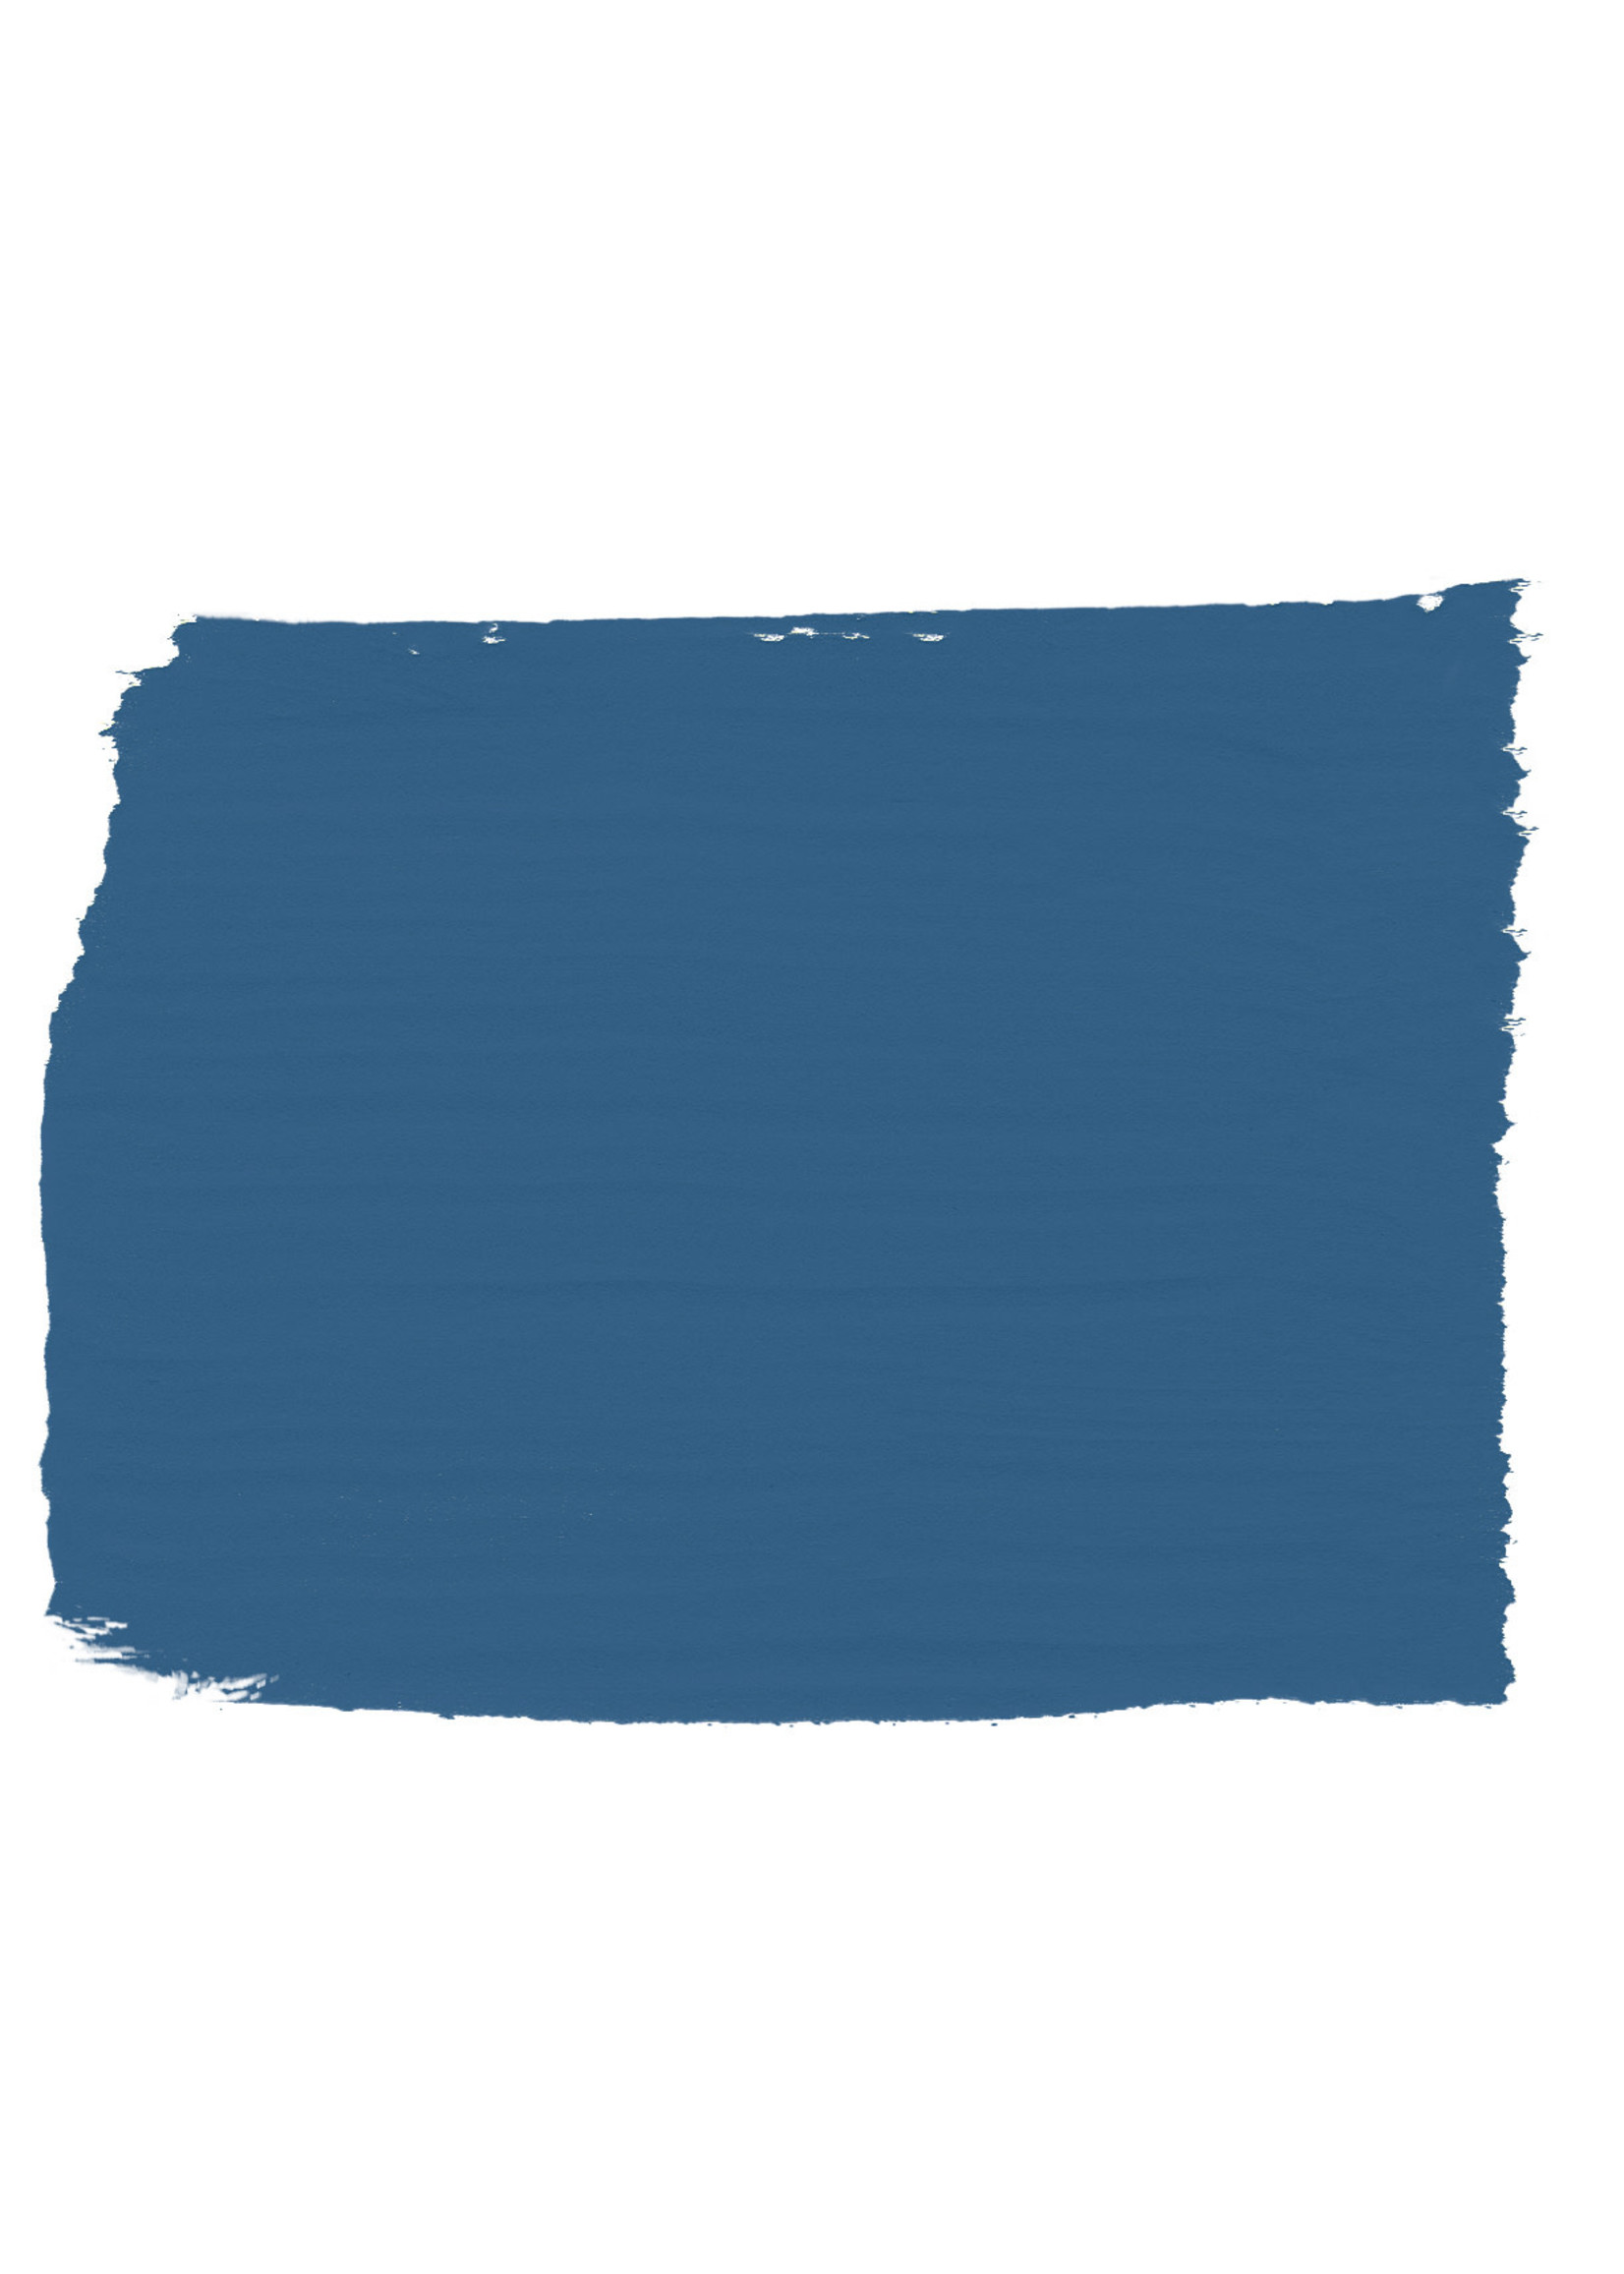 Annie Sloan Chalk Paint® Giverny Annie Sloan Chalk Paint ®